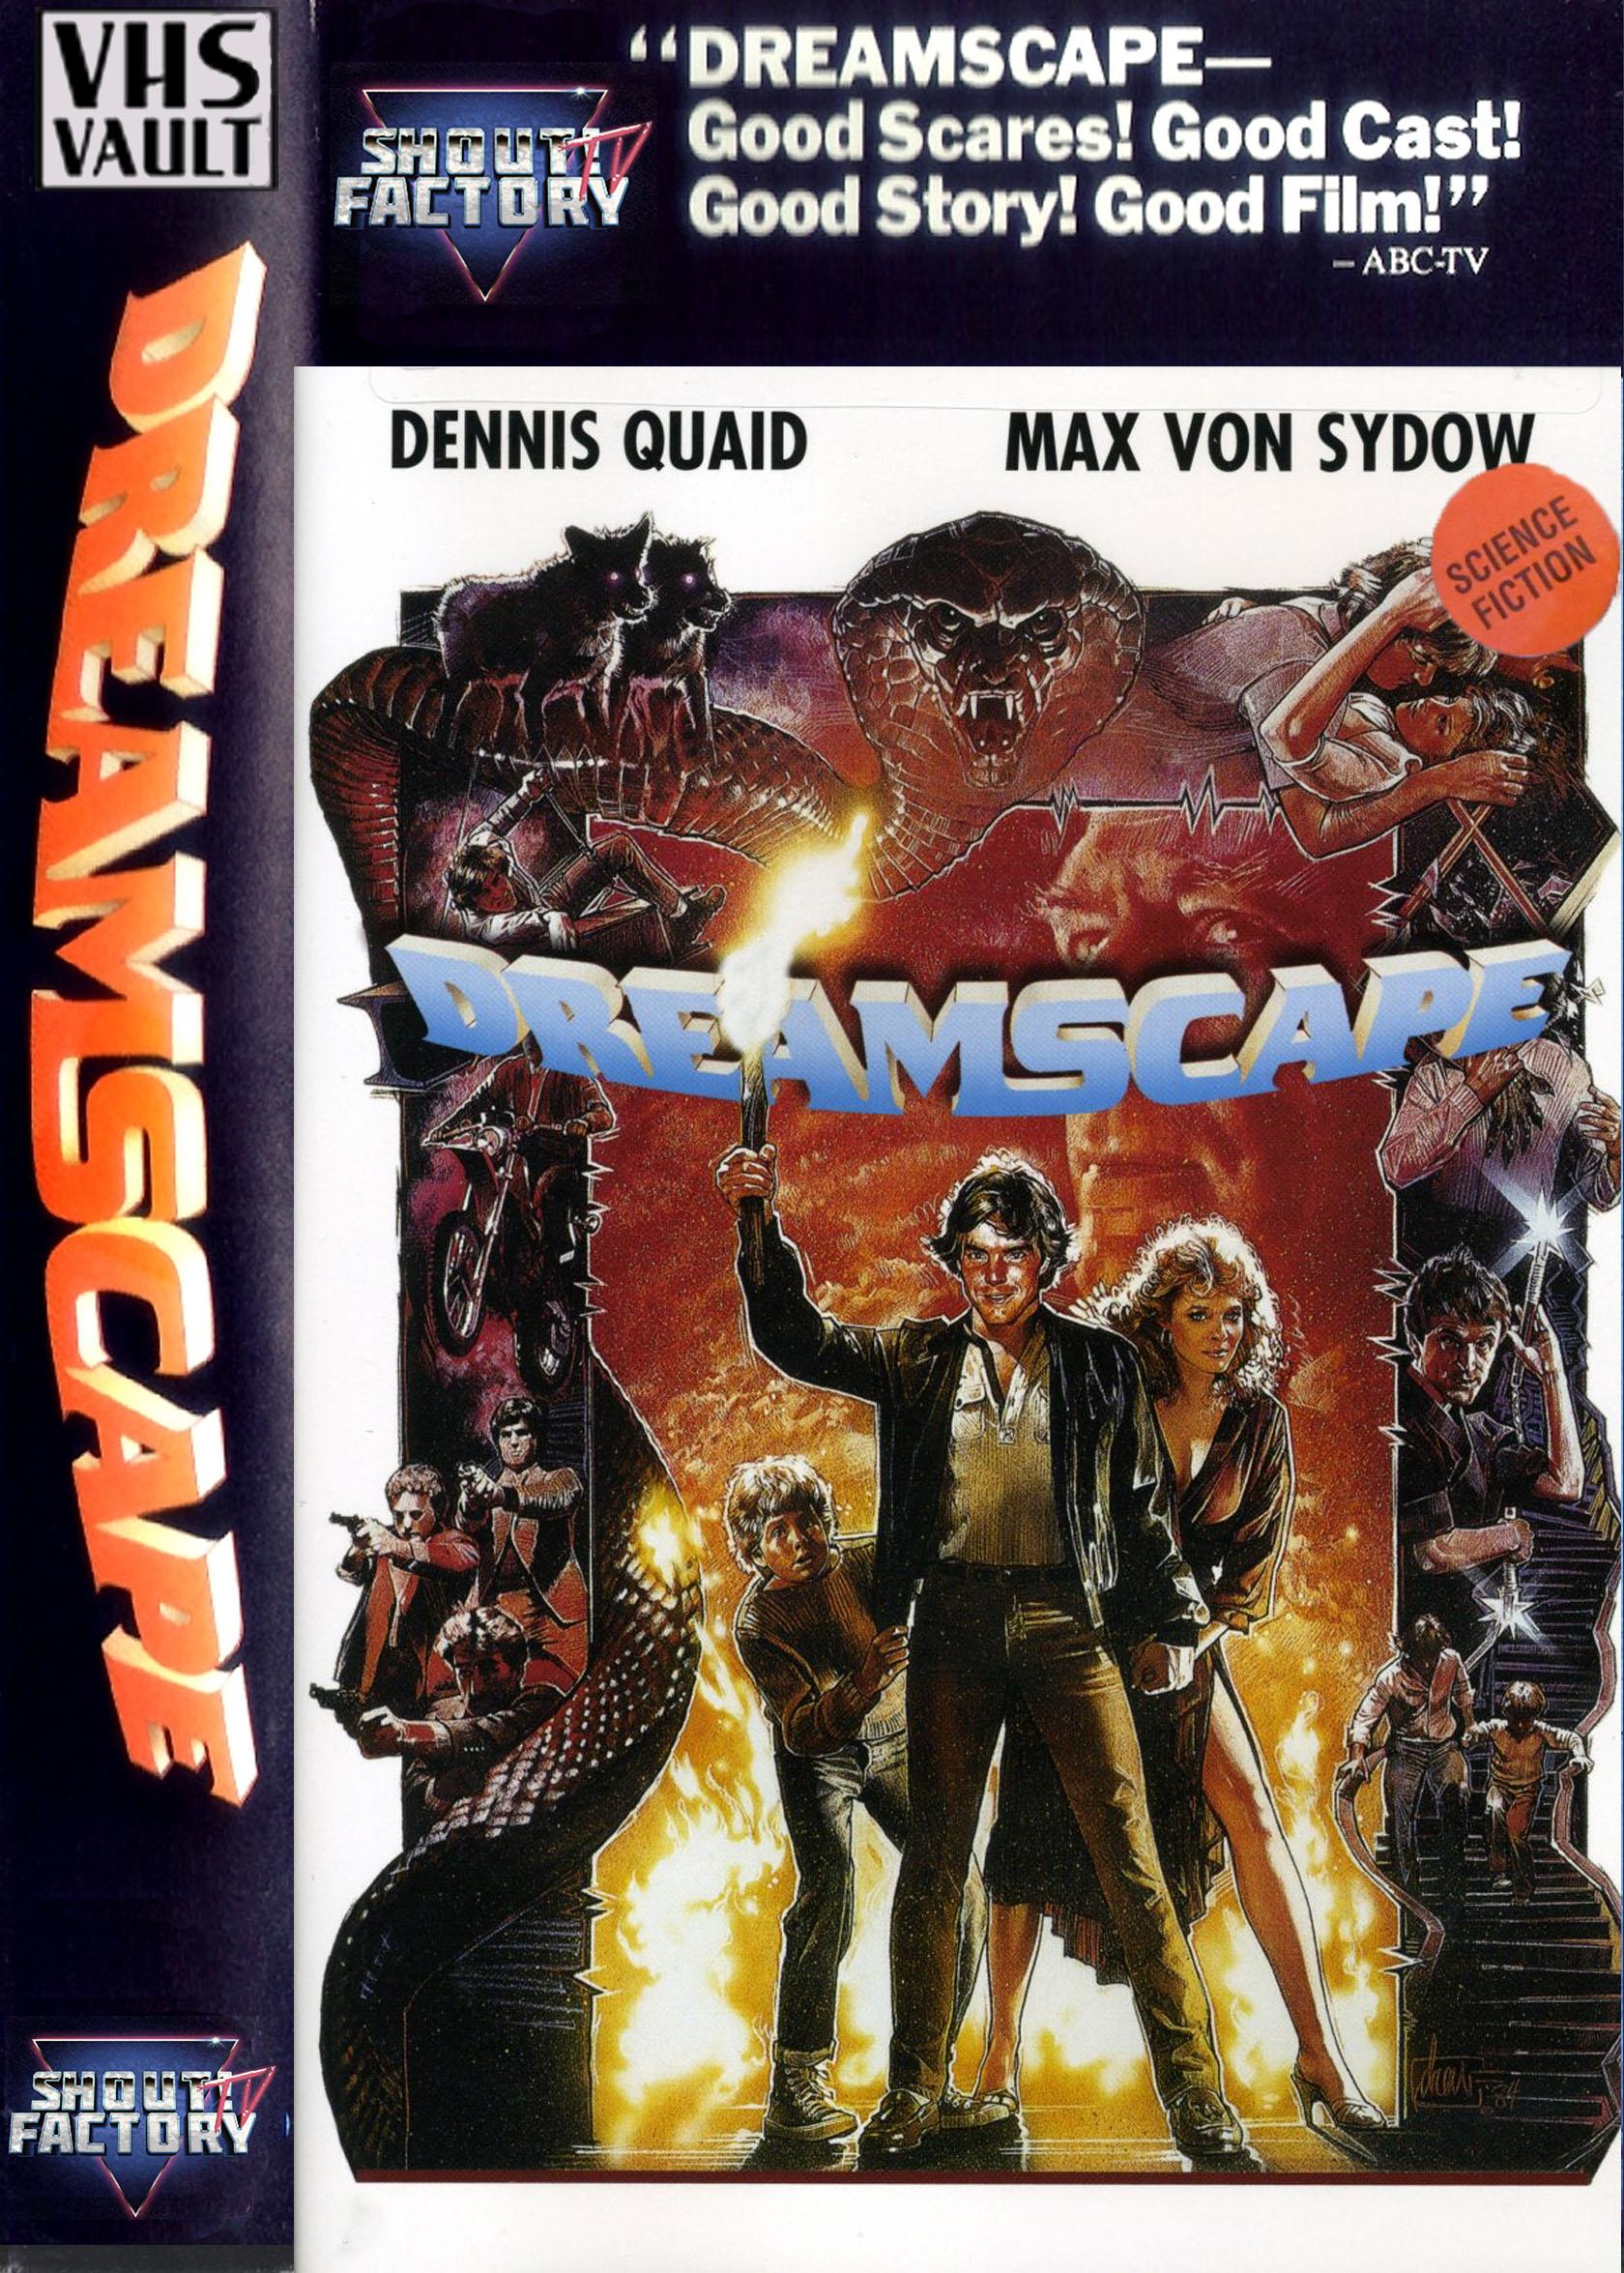 Dreamscape [VHS Vault]